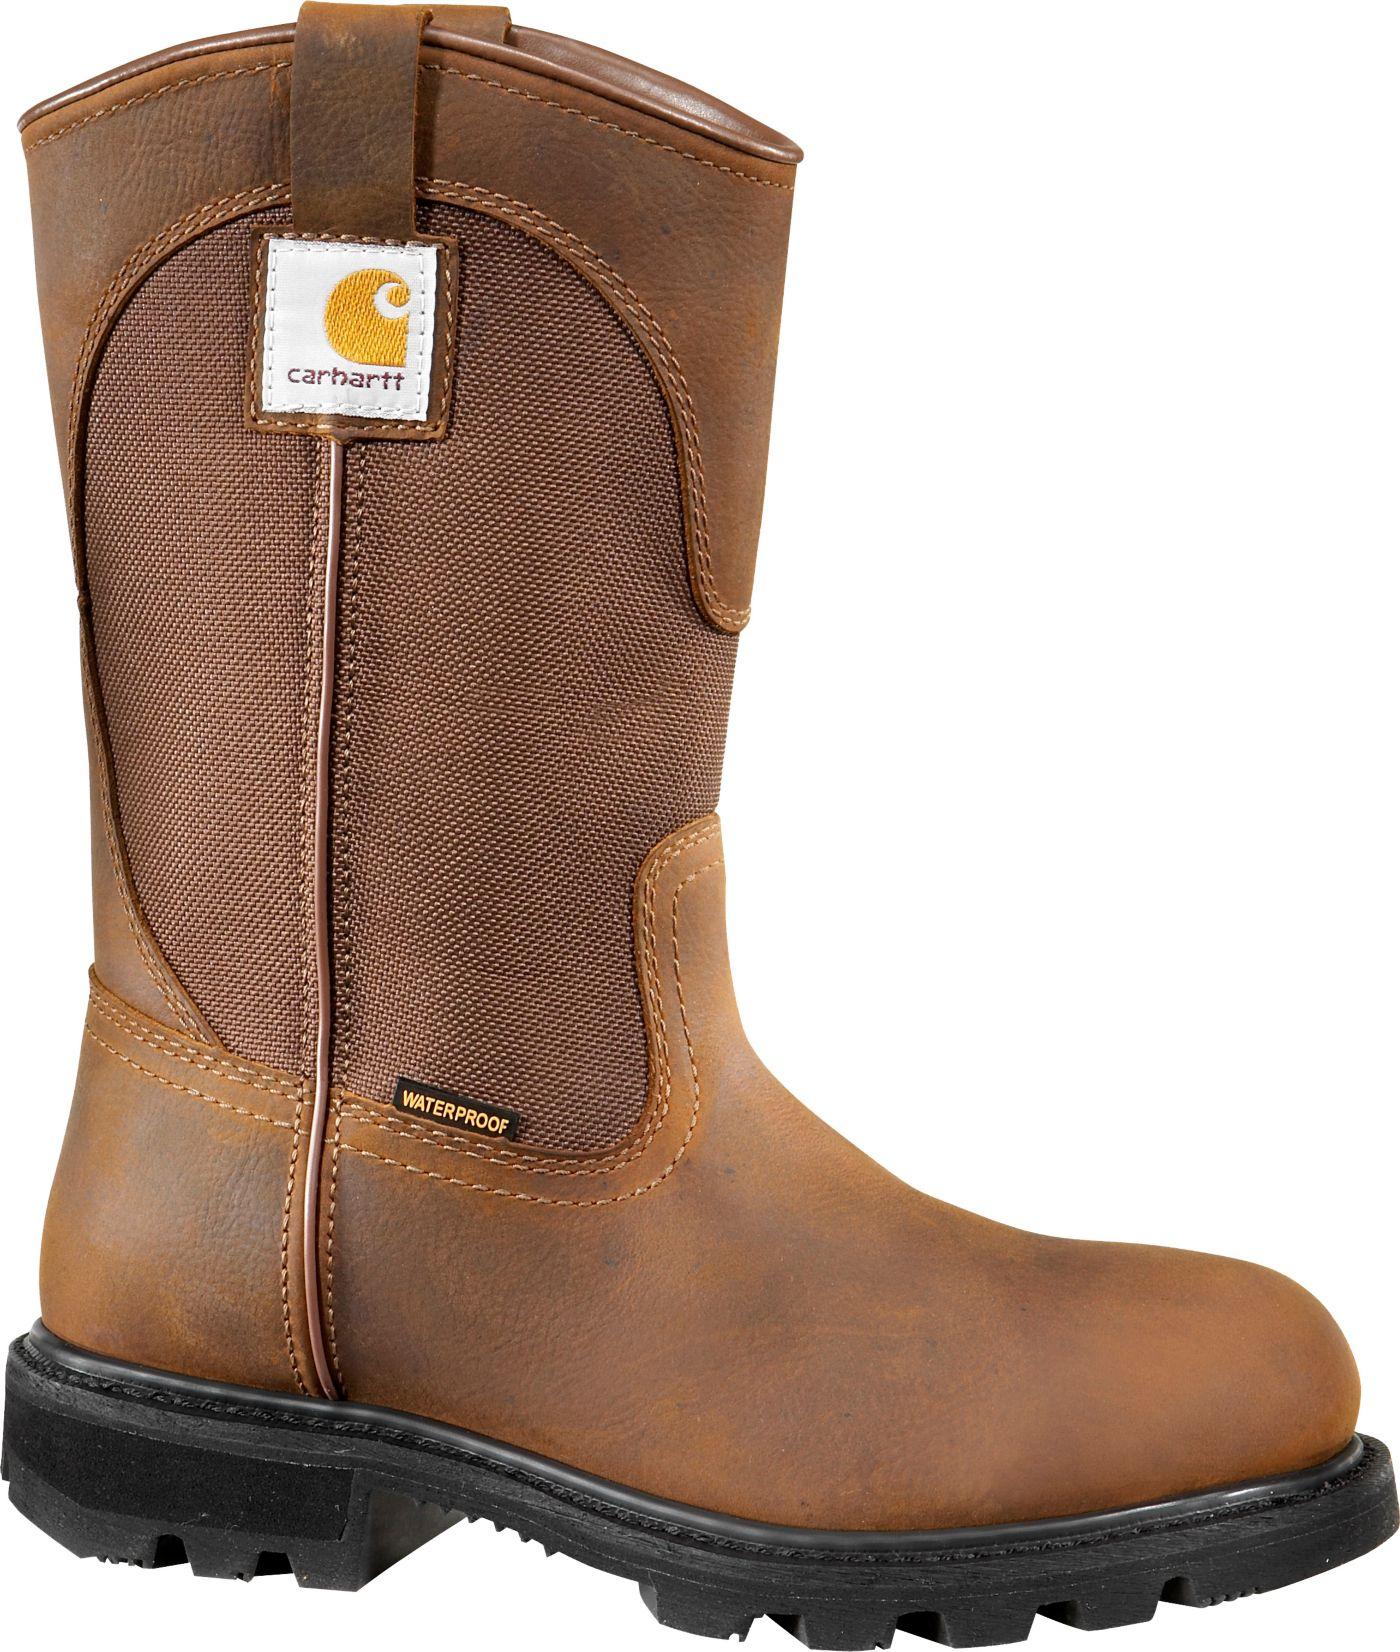 "Carhartt Women's Wellington 10"" Waterproof Work Boots"